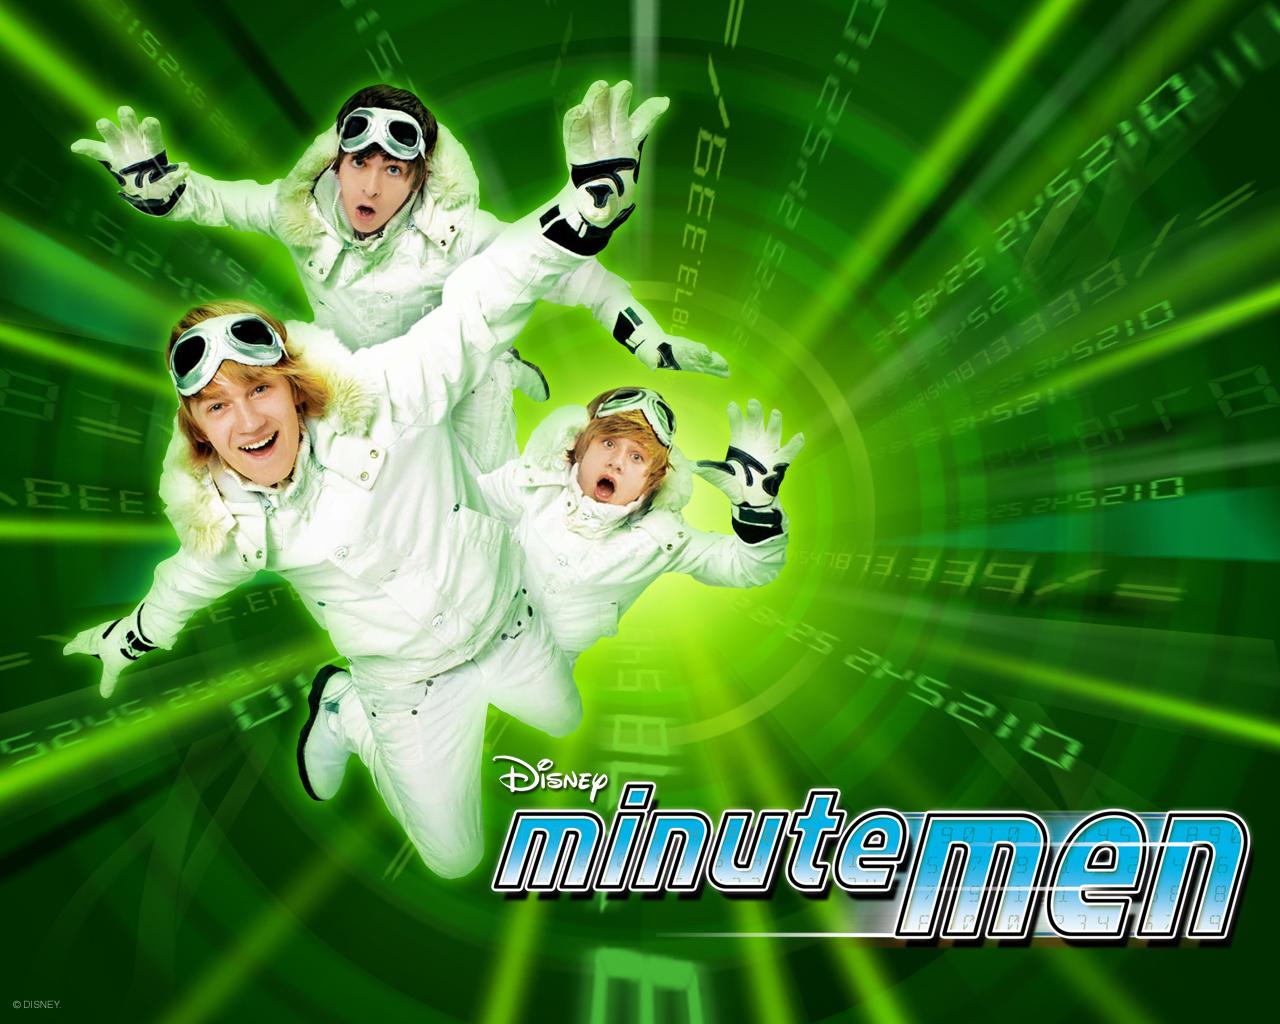 http://images.fanpop.com/images/image_uploads/Minutemen-minute-men-759489_1280_1024.jpg